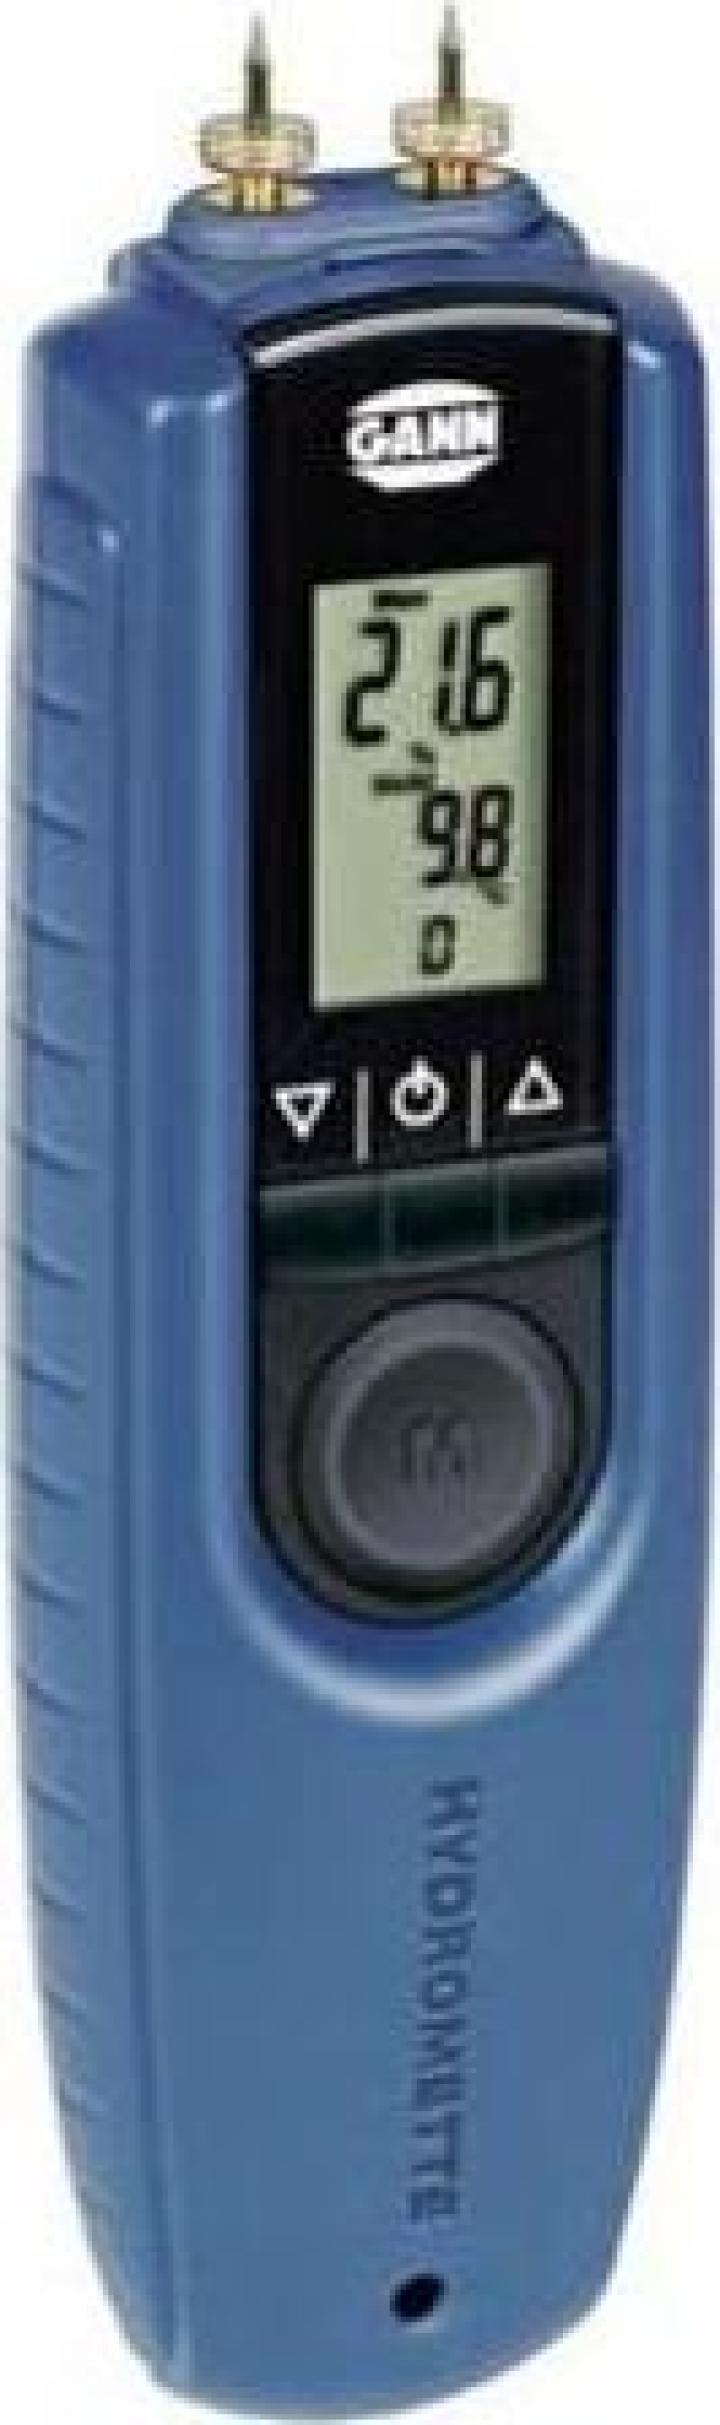 Analizor de umiditate Gann Hydromette BL Compact